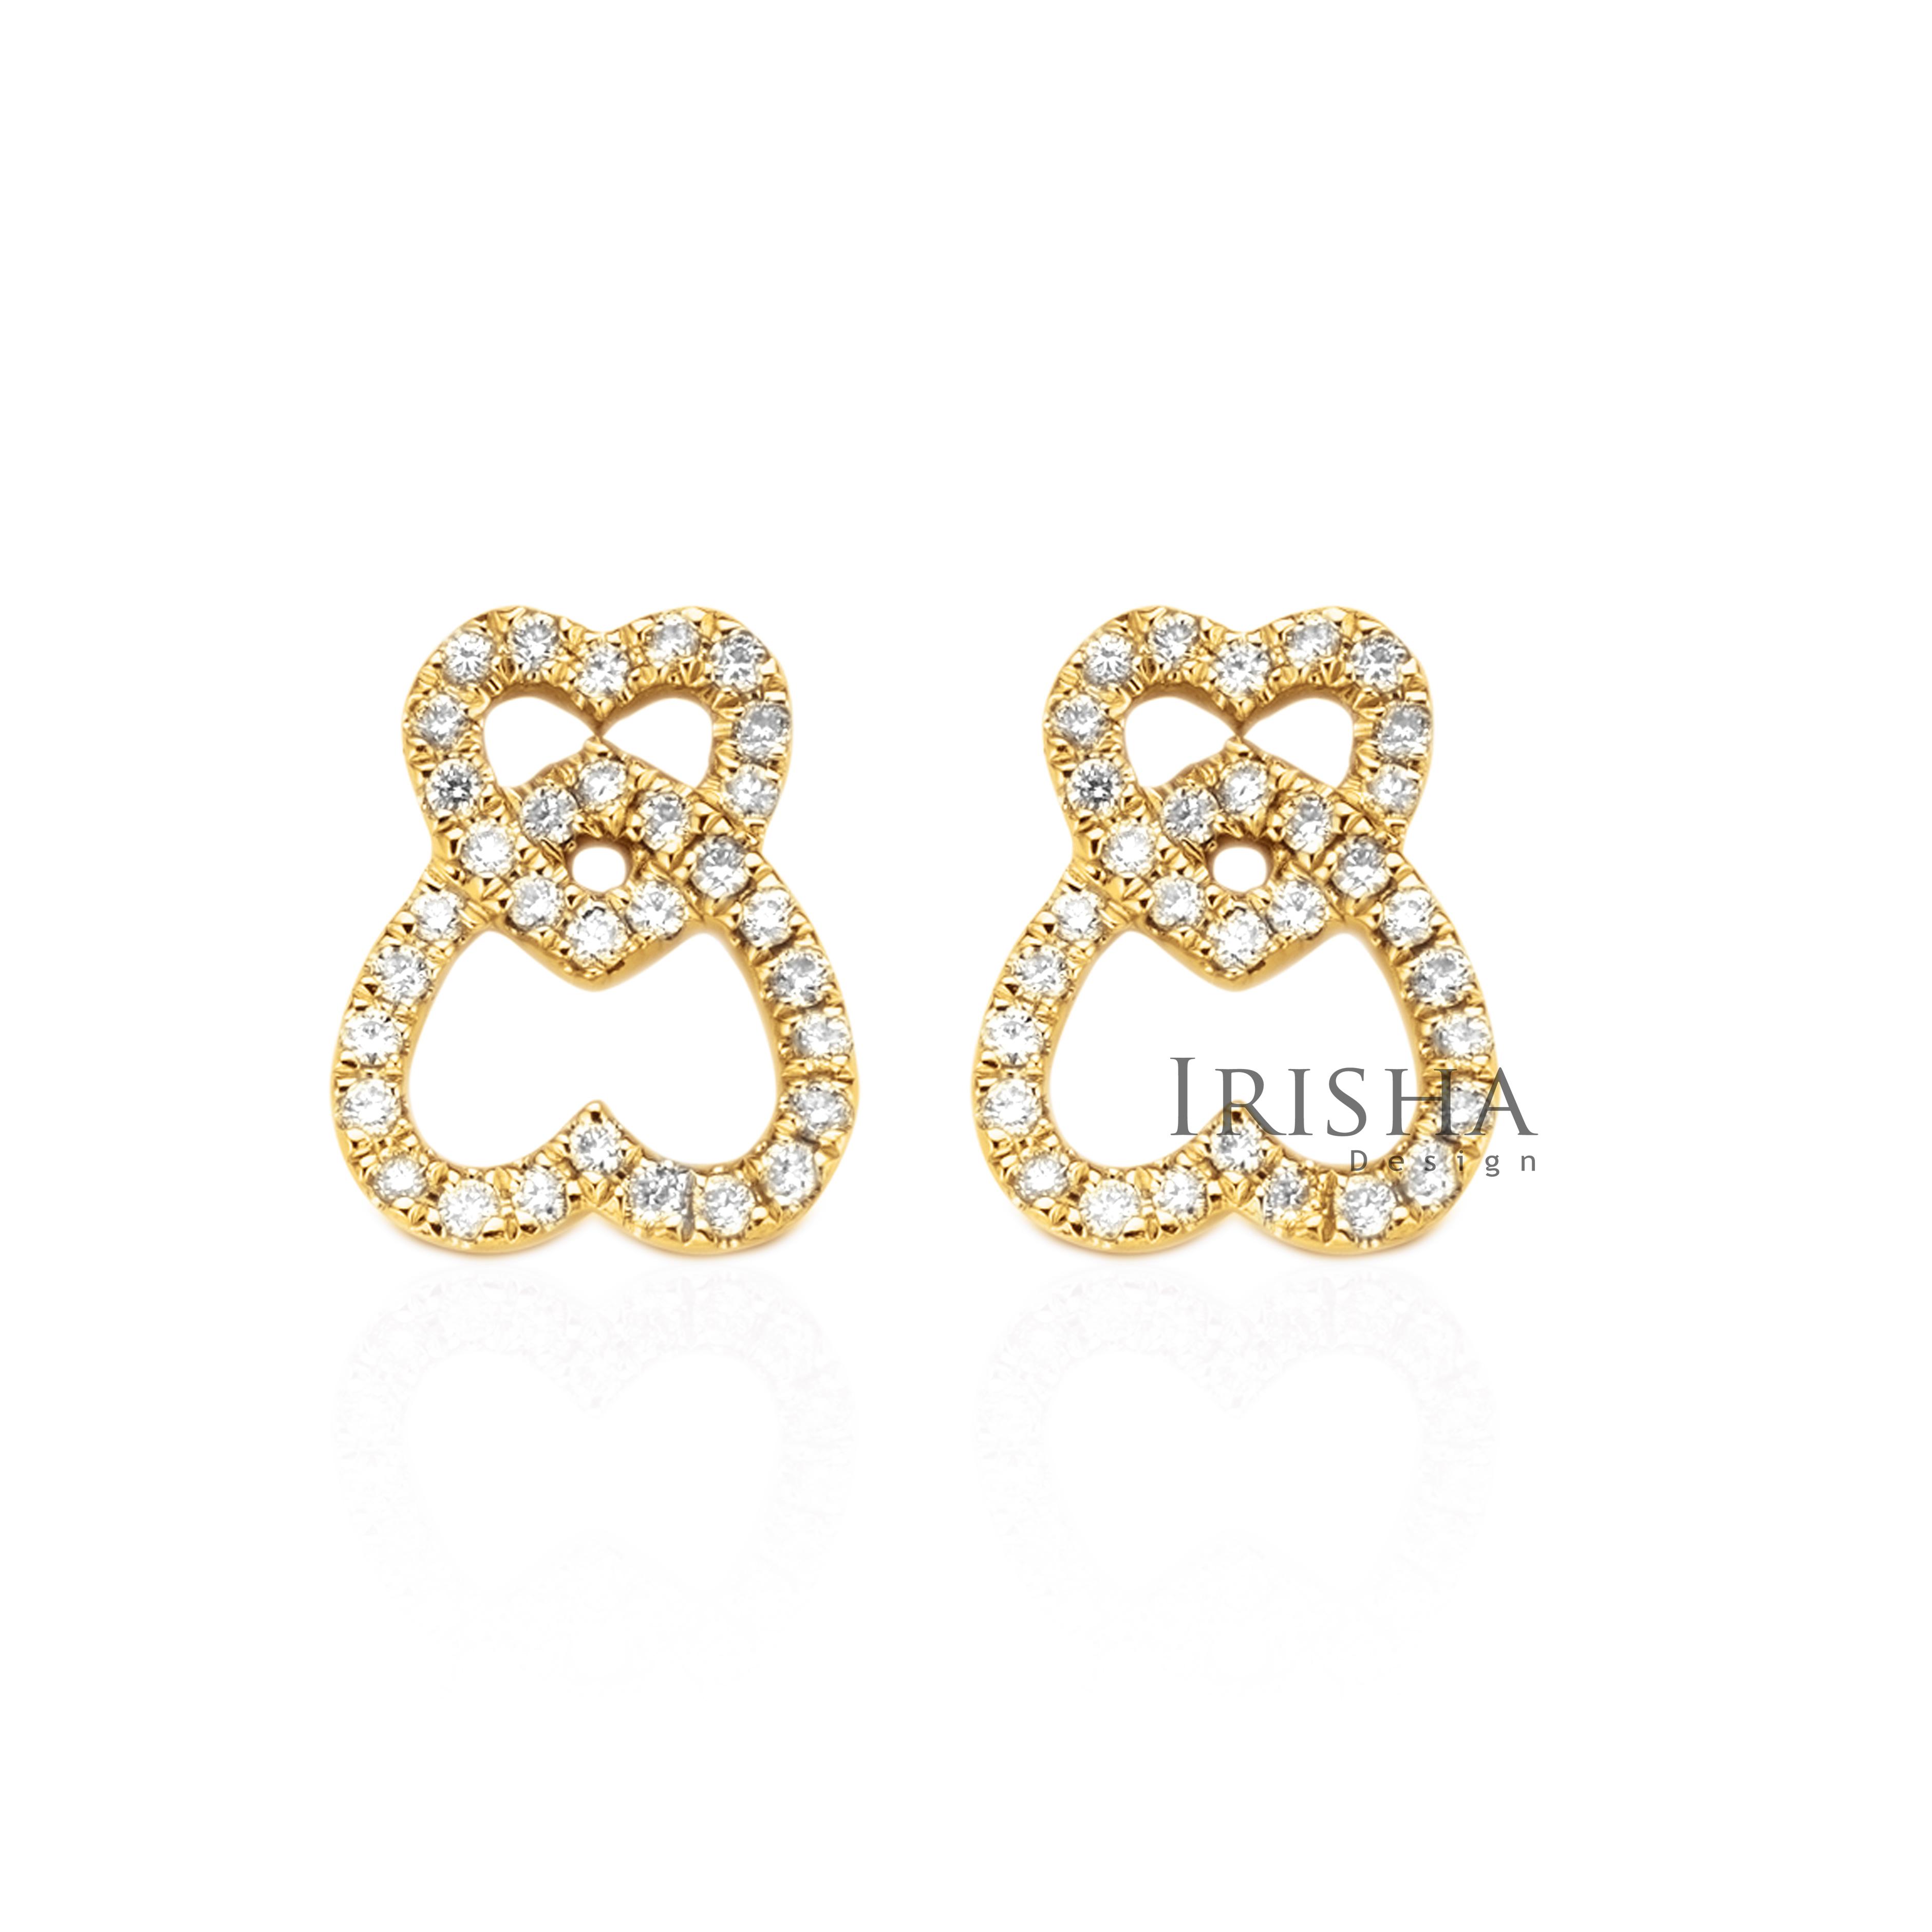 14K Gold 0.26 Ct. Genuine Diamond Heart In Heart Mother's Day Studs Earrings